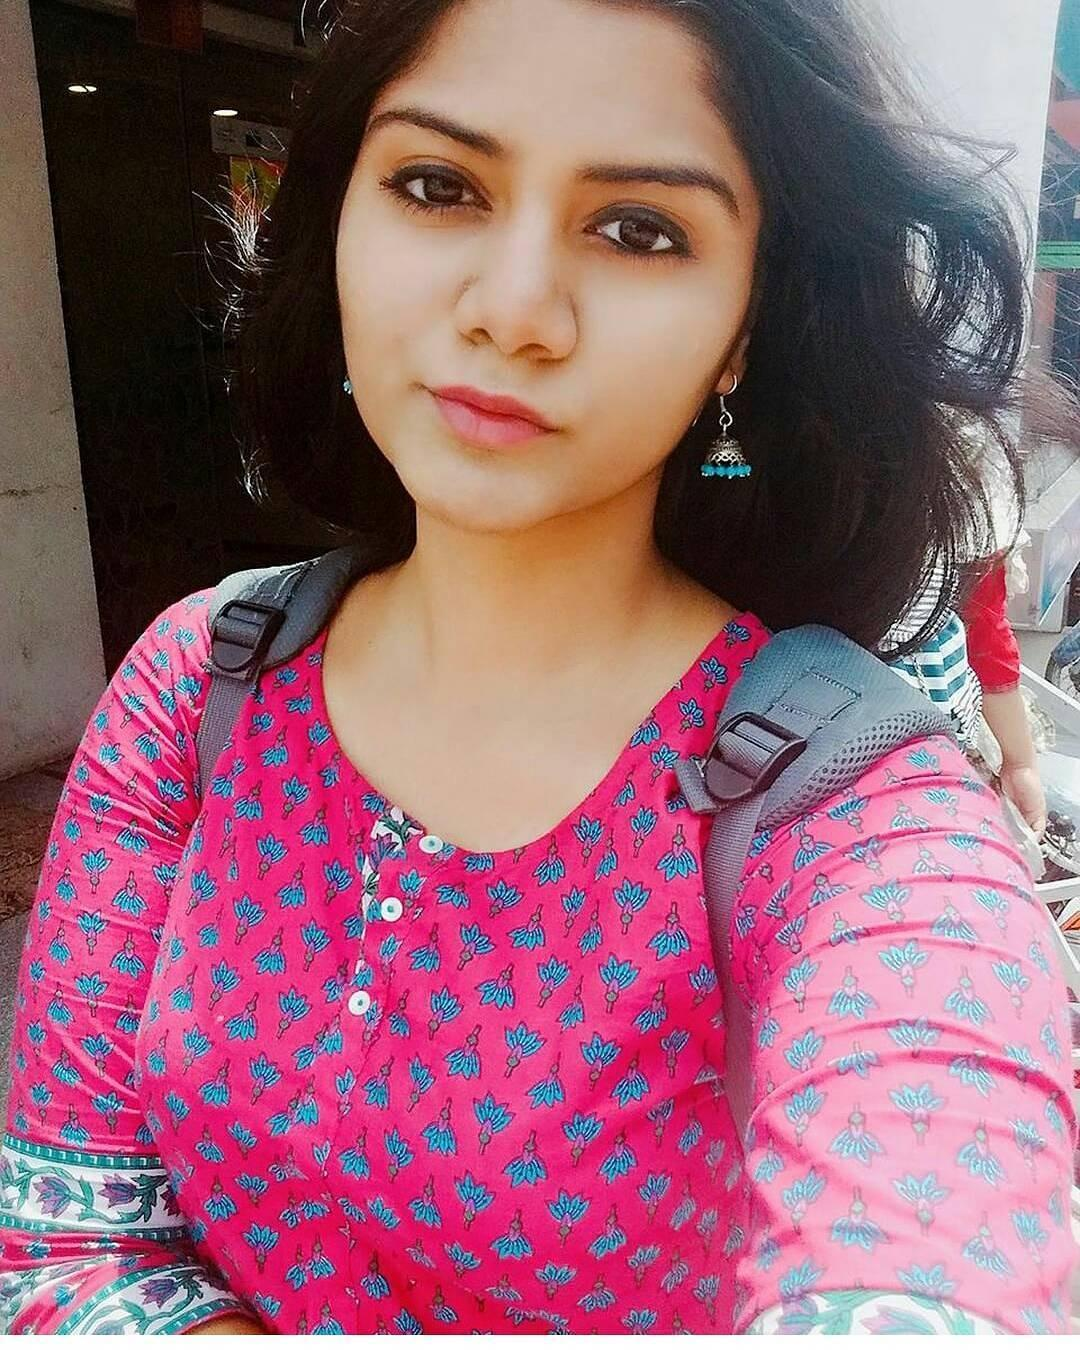 Beautiful Indian Girls | Most Beautiful Indian Girl Images